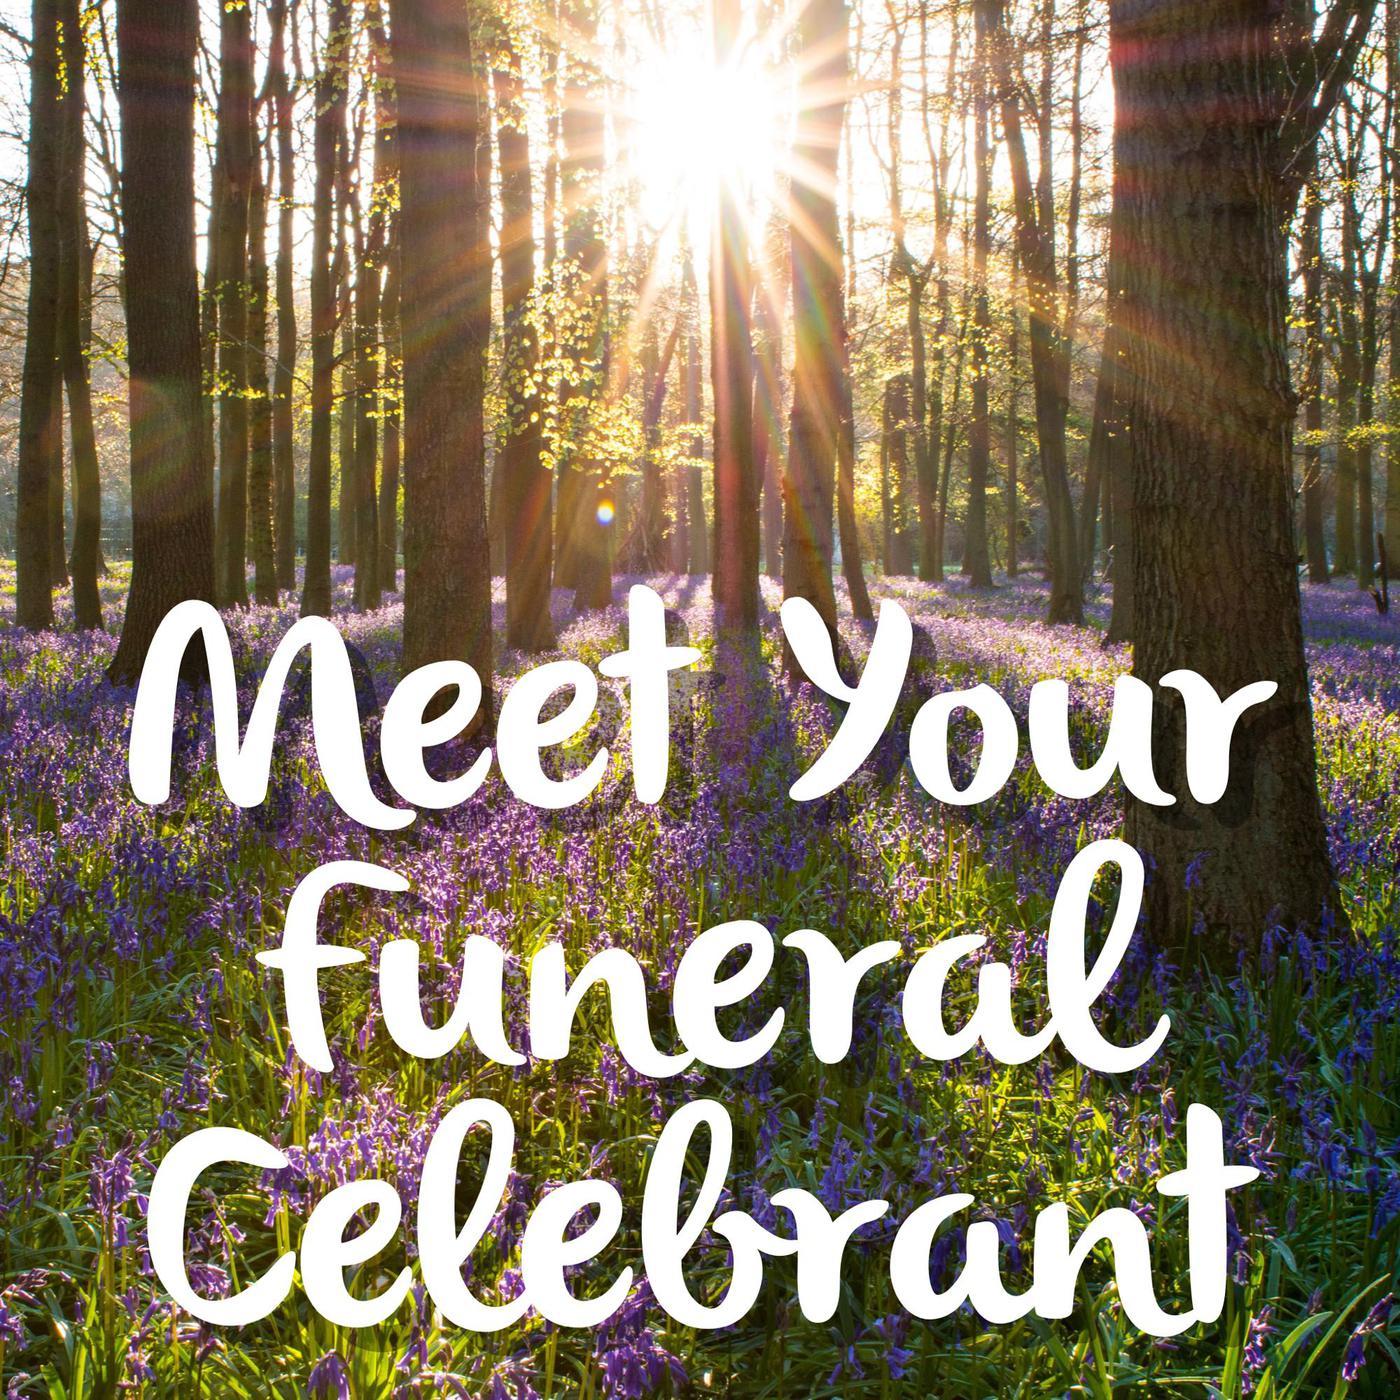 Funeral Celebrant Role